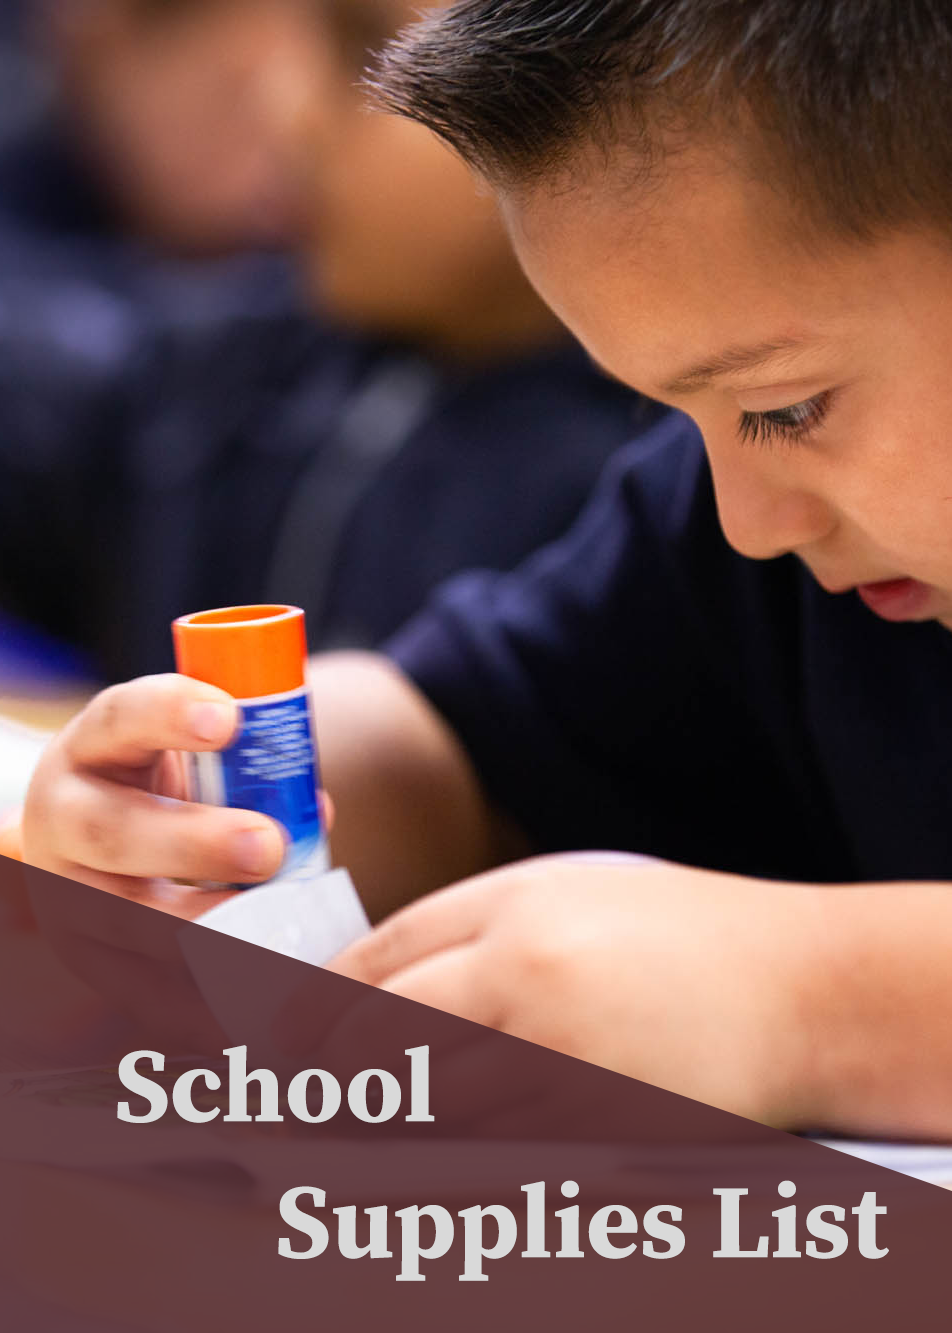 Elementary - School Supplies List.png